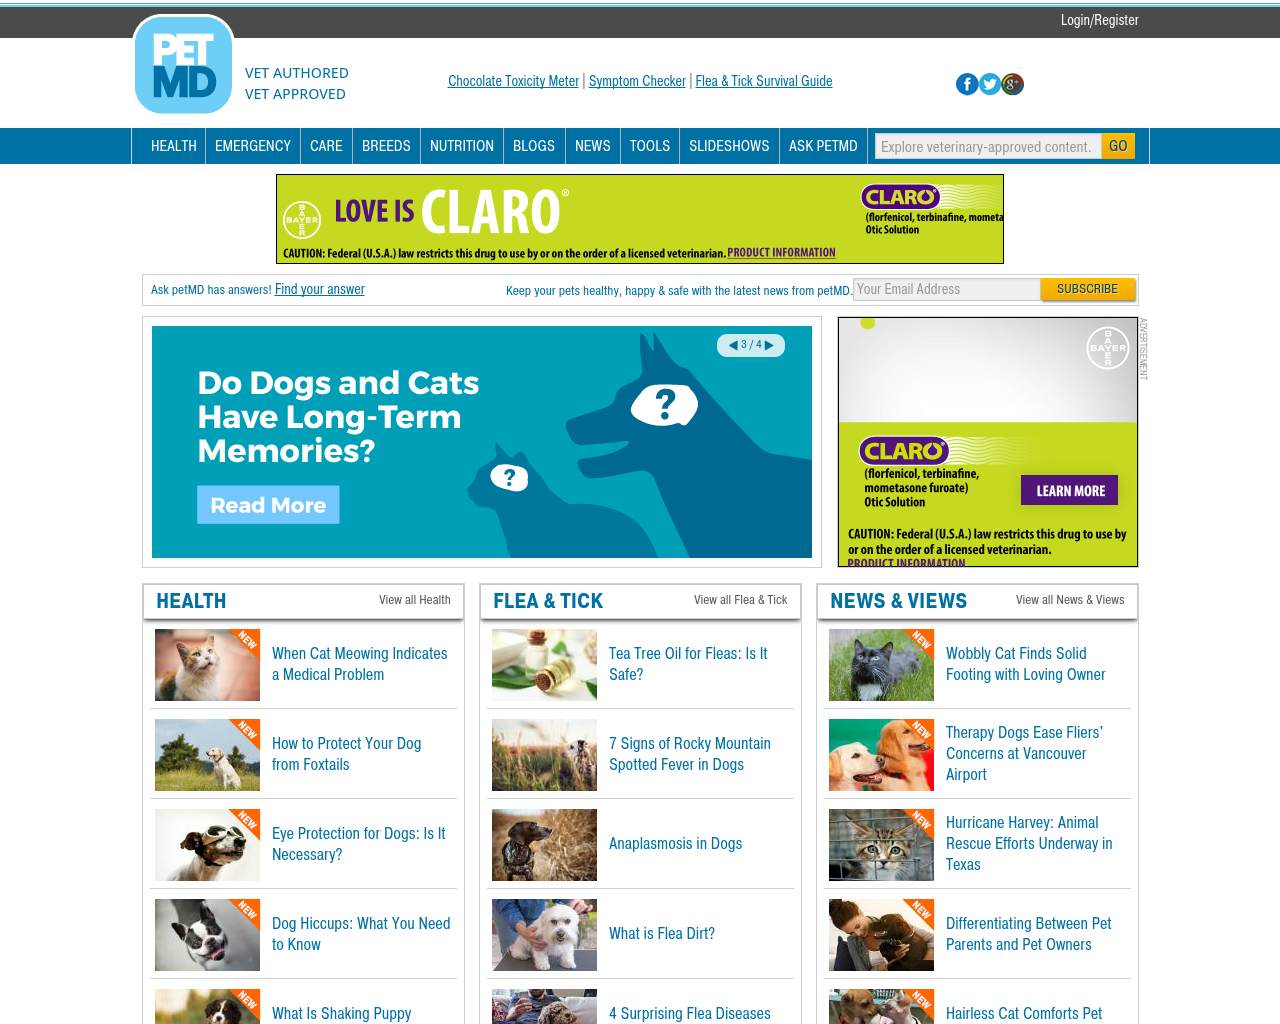 Pet-MD-Advertising-Reviews-Pricing